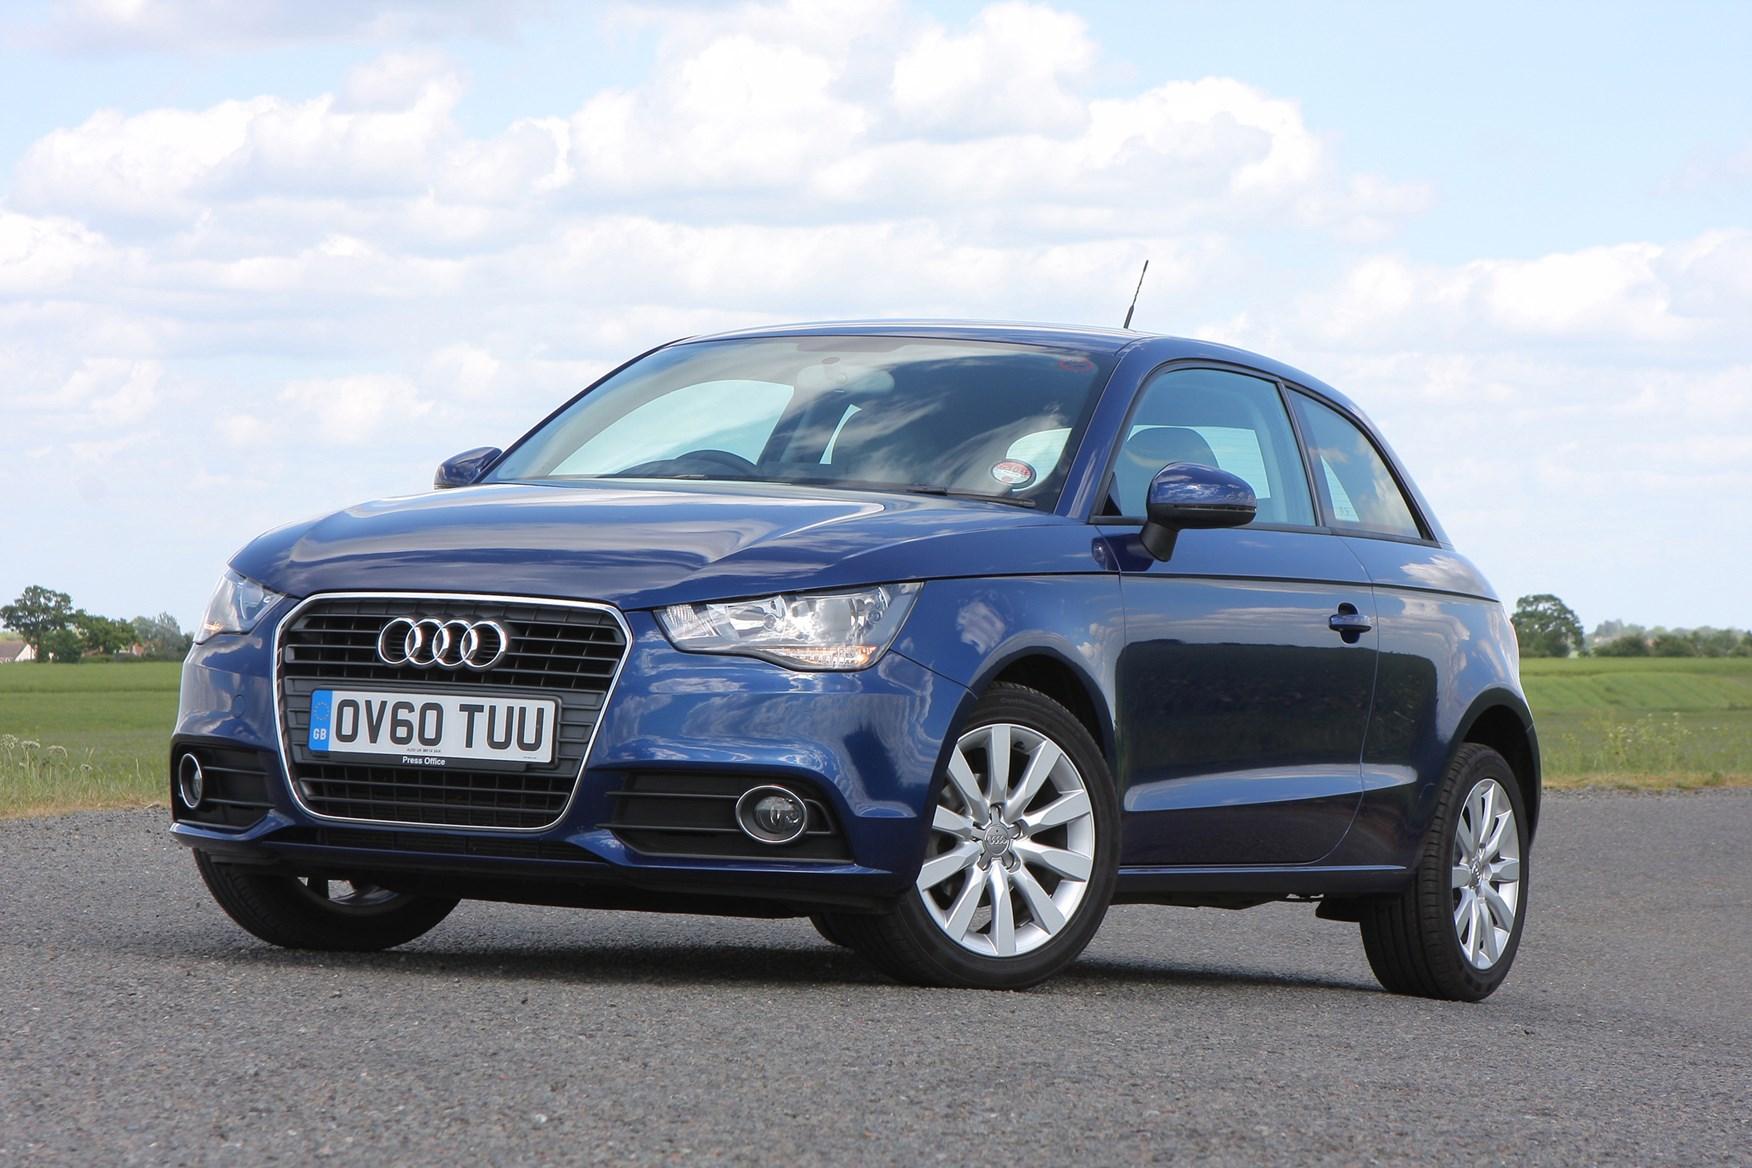 Audi A1 Hatchback Review Video Parkers